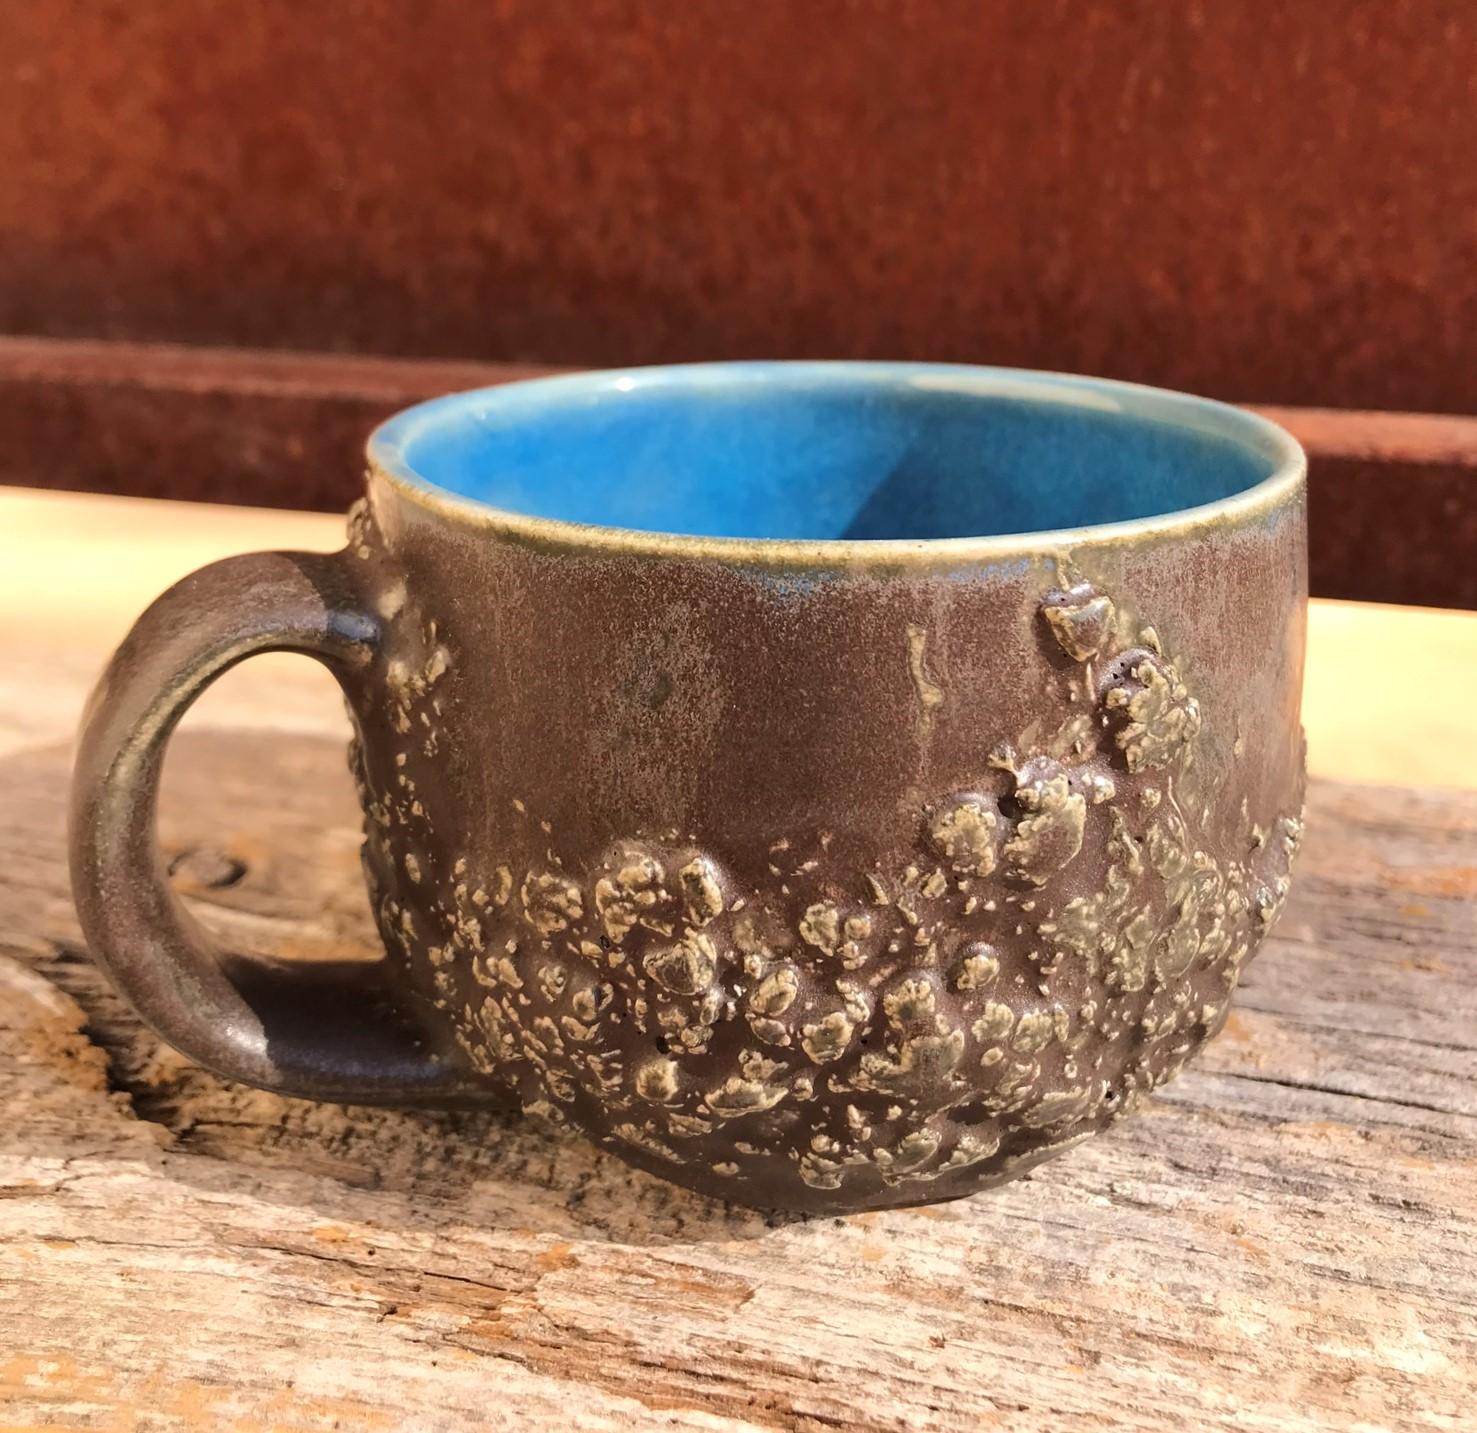 Craggy Texture Stoneware Mug - Rutile Haze/Oasis